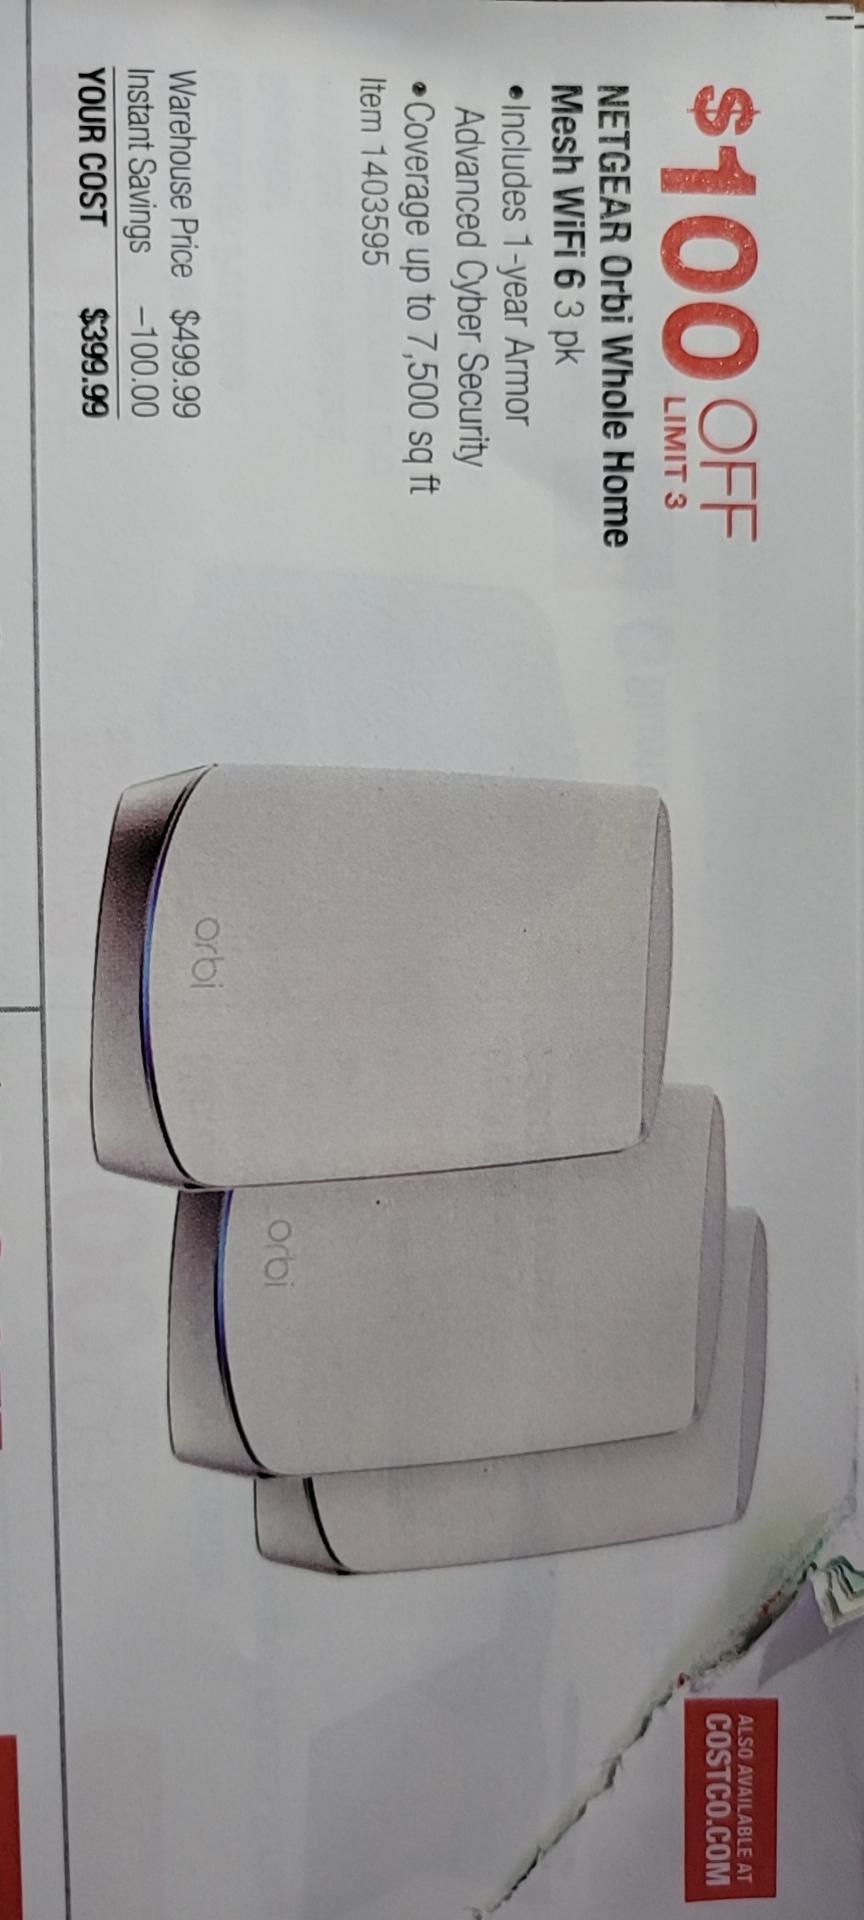 NETGEAR Orbi Whole Home Mesh WiFi 6 System 3-pack $399.99  alive